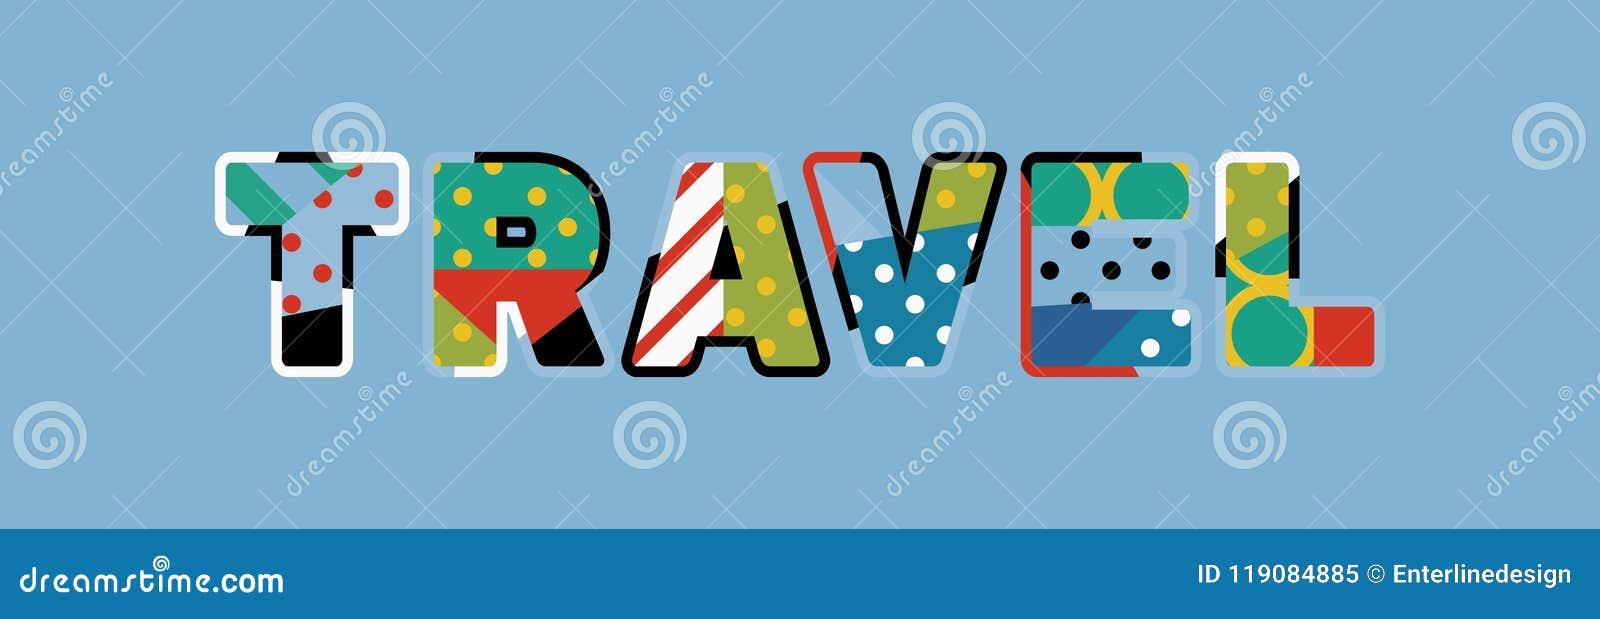 travel concept word art illustration stock vector illustration of